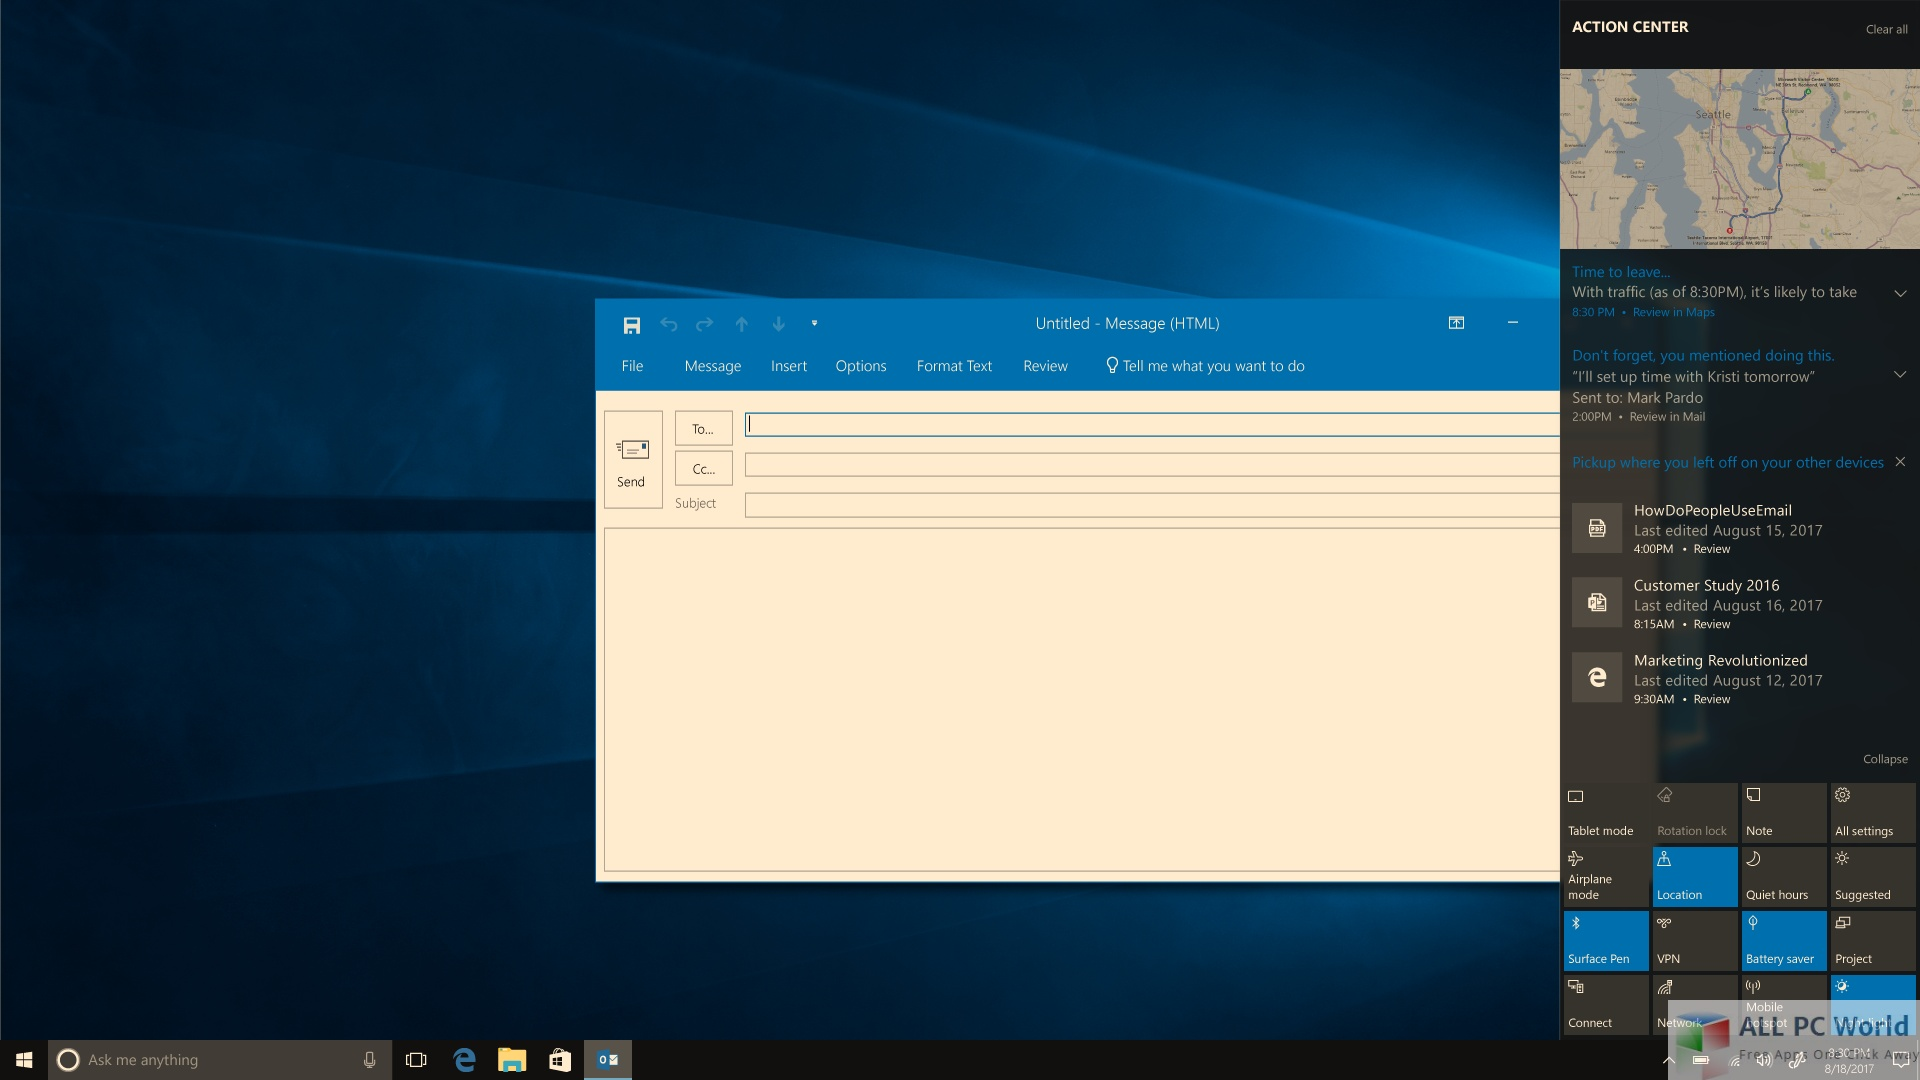 Download Windows 10 Enterprise Creators Update Apr 2017 Free